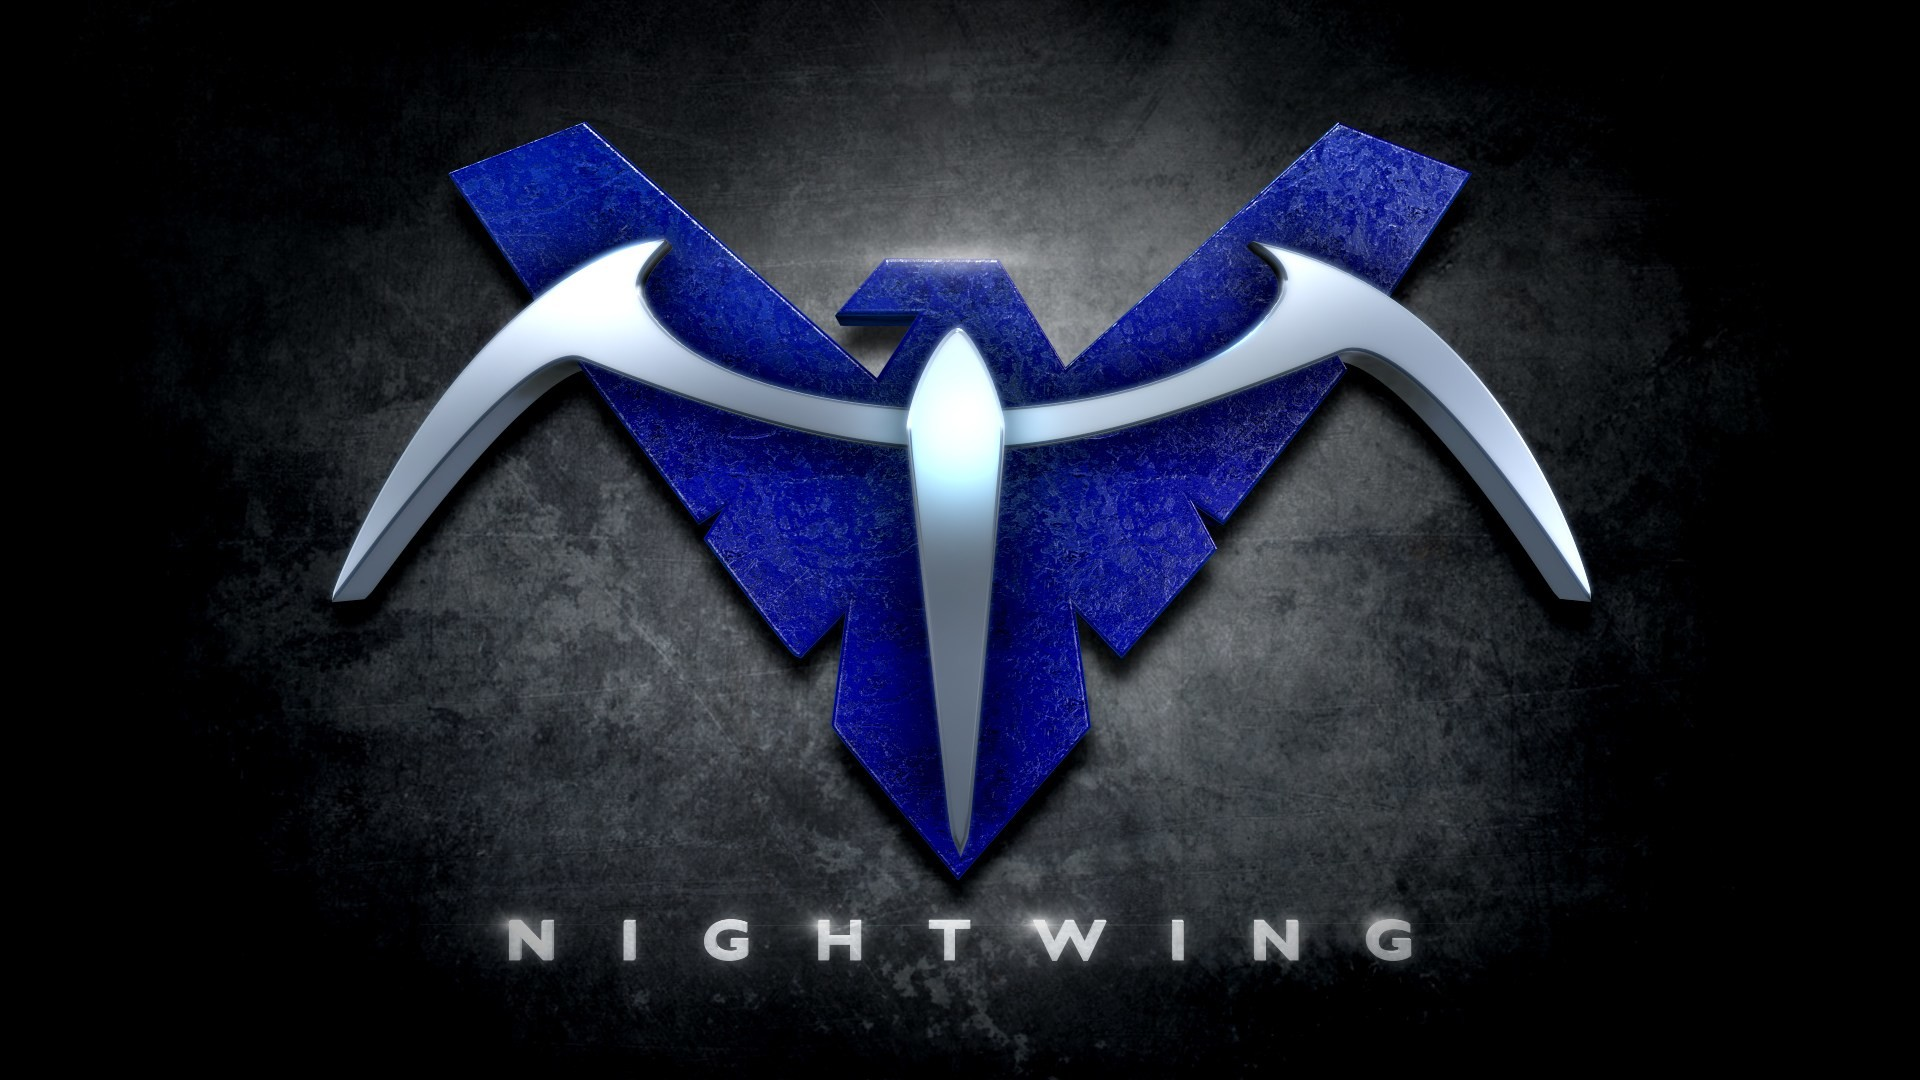 Nightwing Symbol Wallpaper hd images